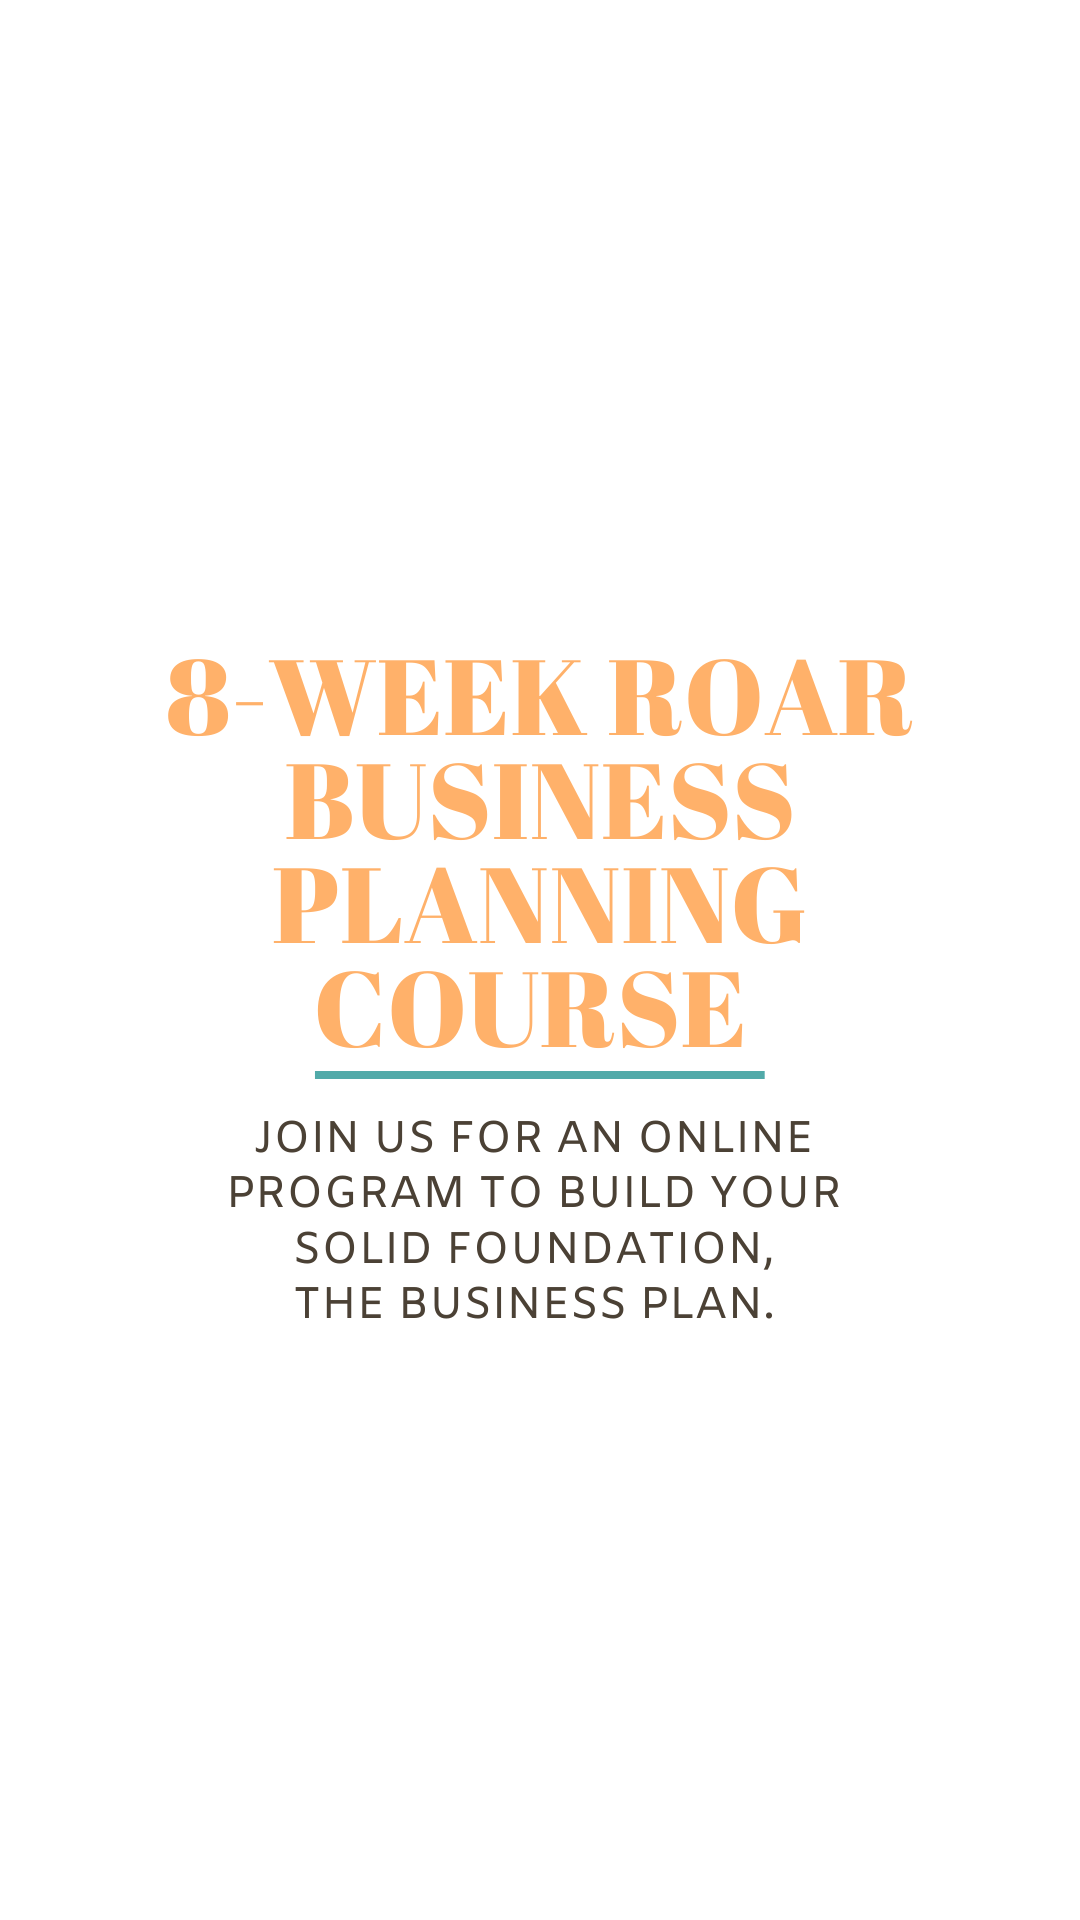 ROAR Business Planning Course